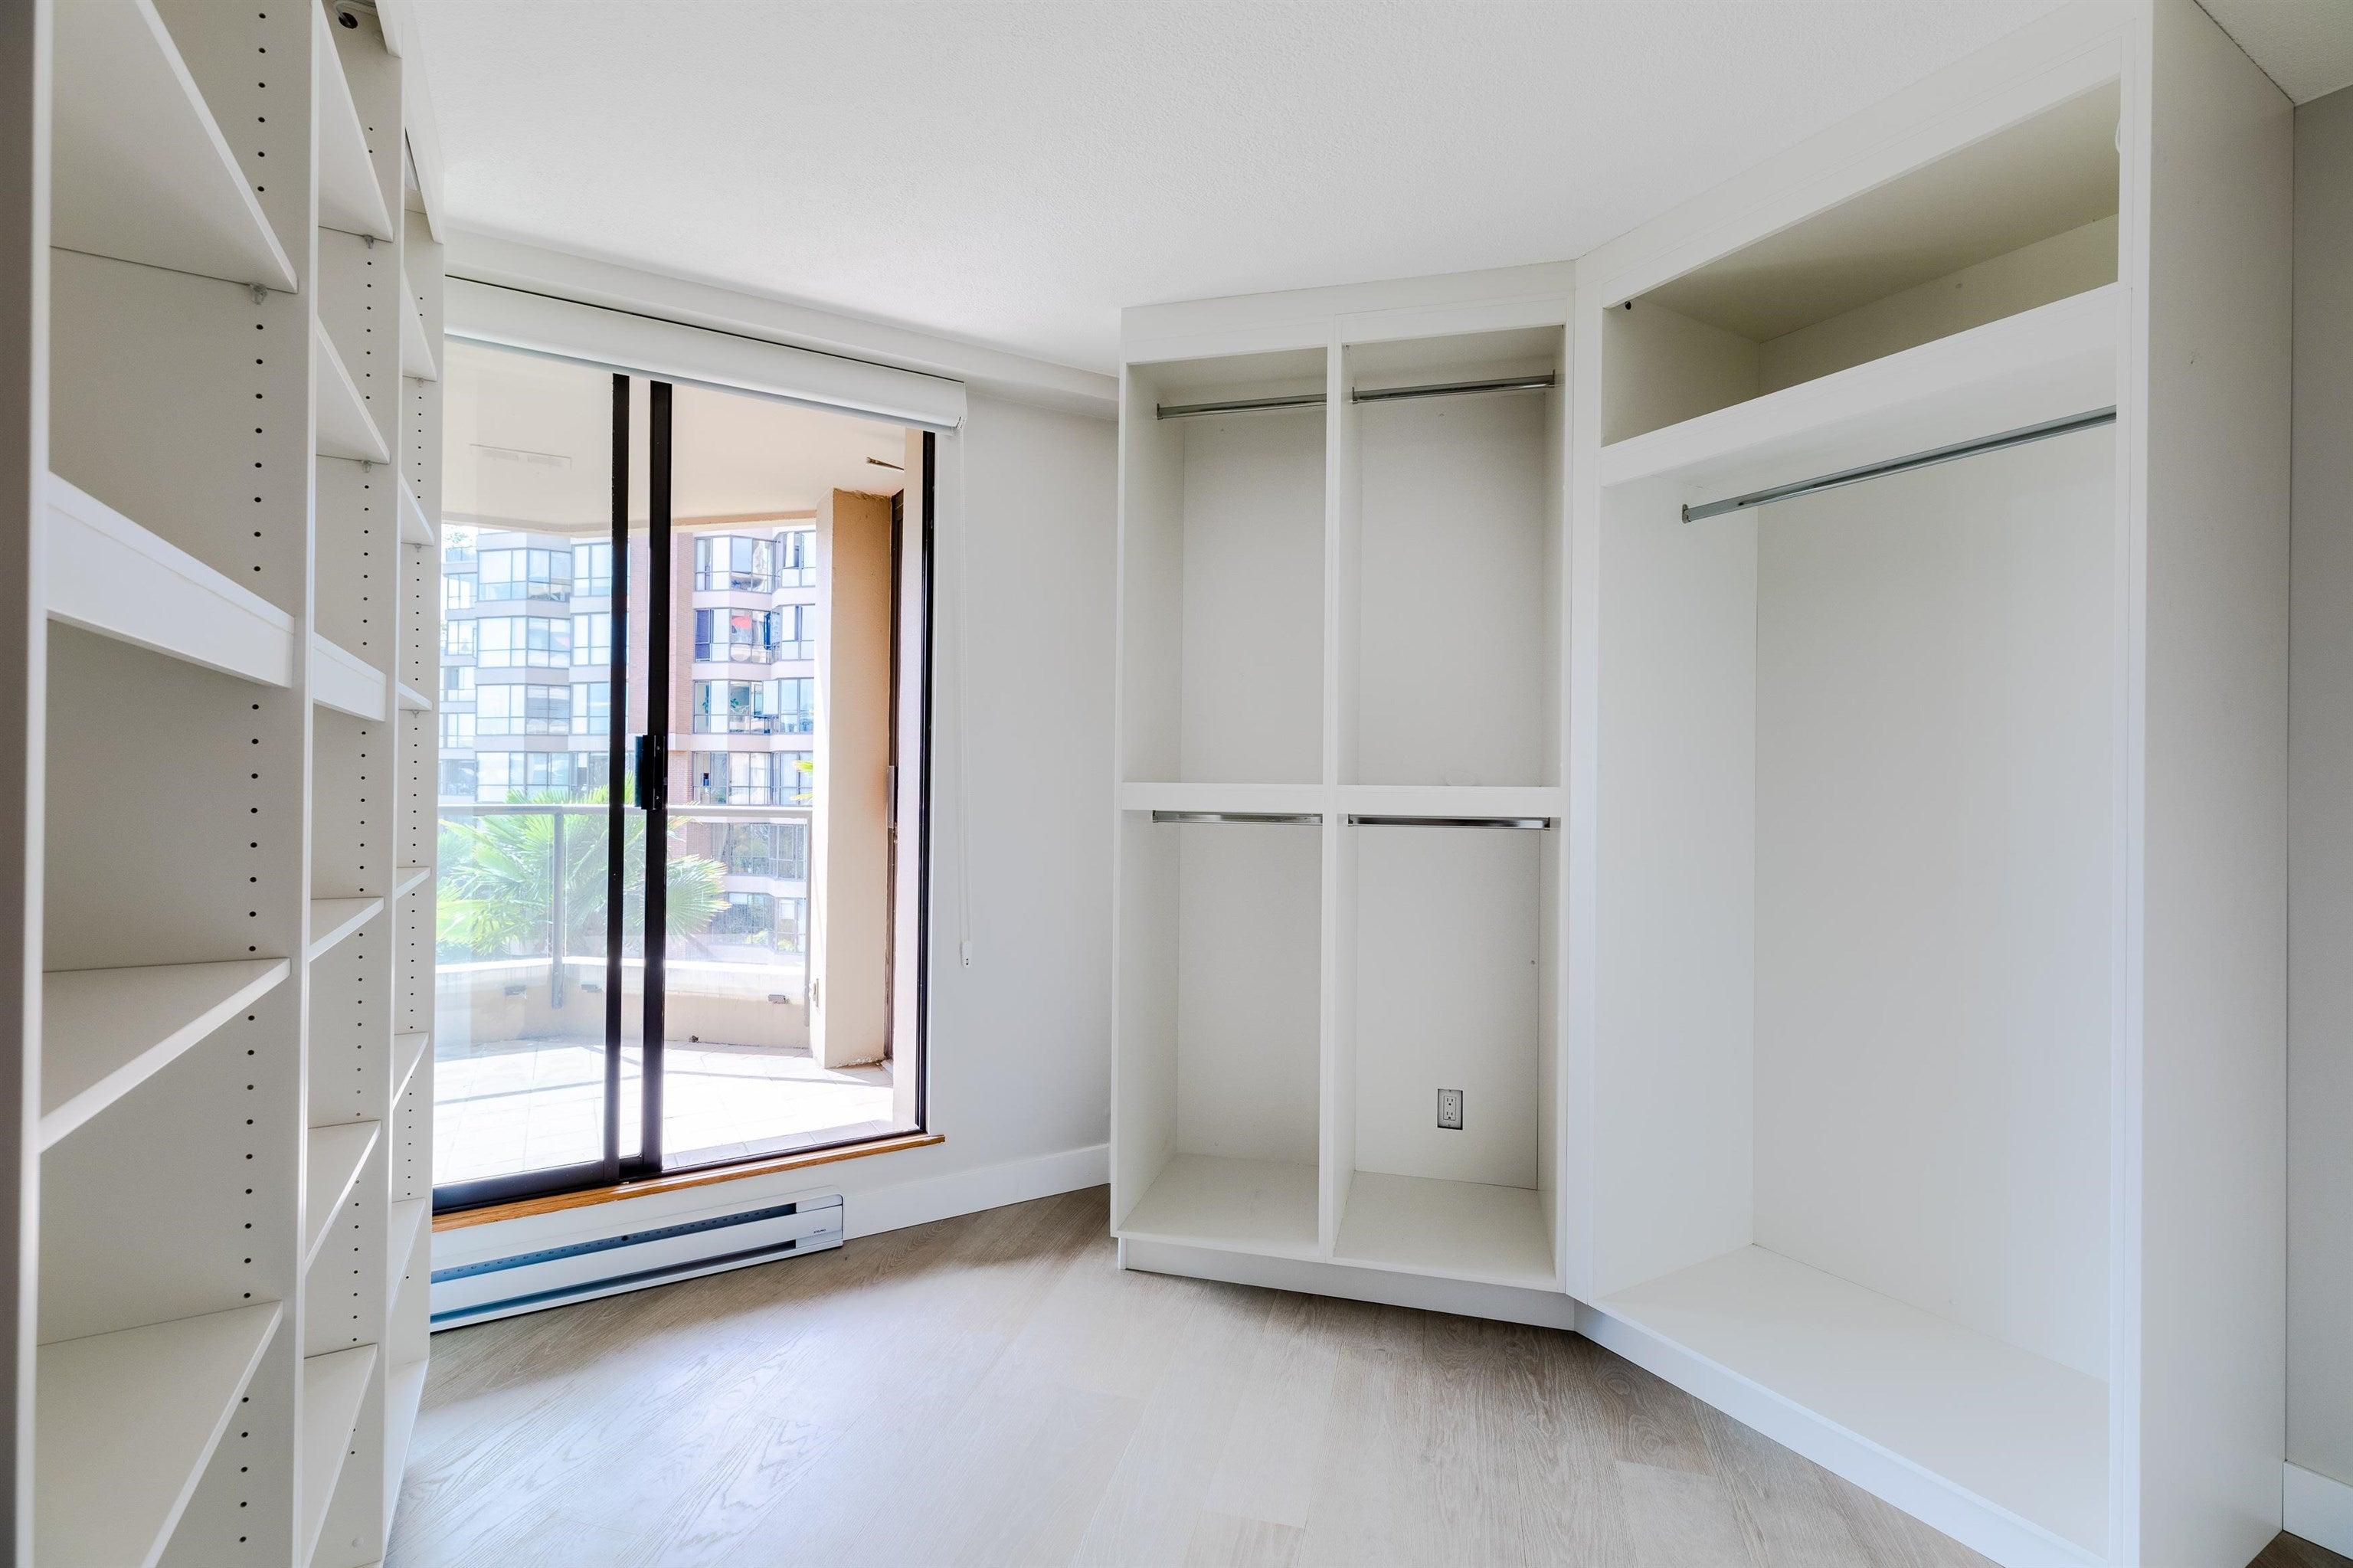 406 1450 PENNYFARTHING DRIVE - False Creek Apartment/Condo for sale, 2 Bedrooms (R2617259) - #18